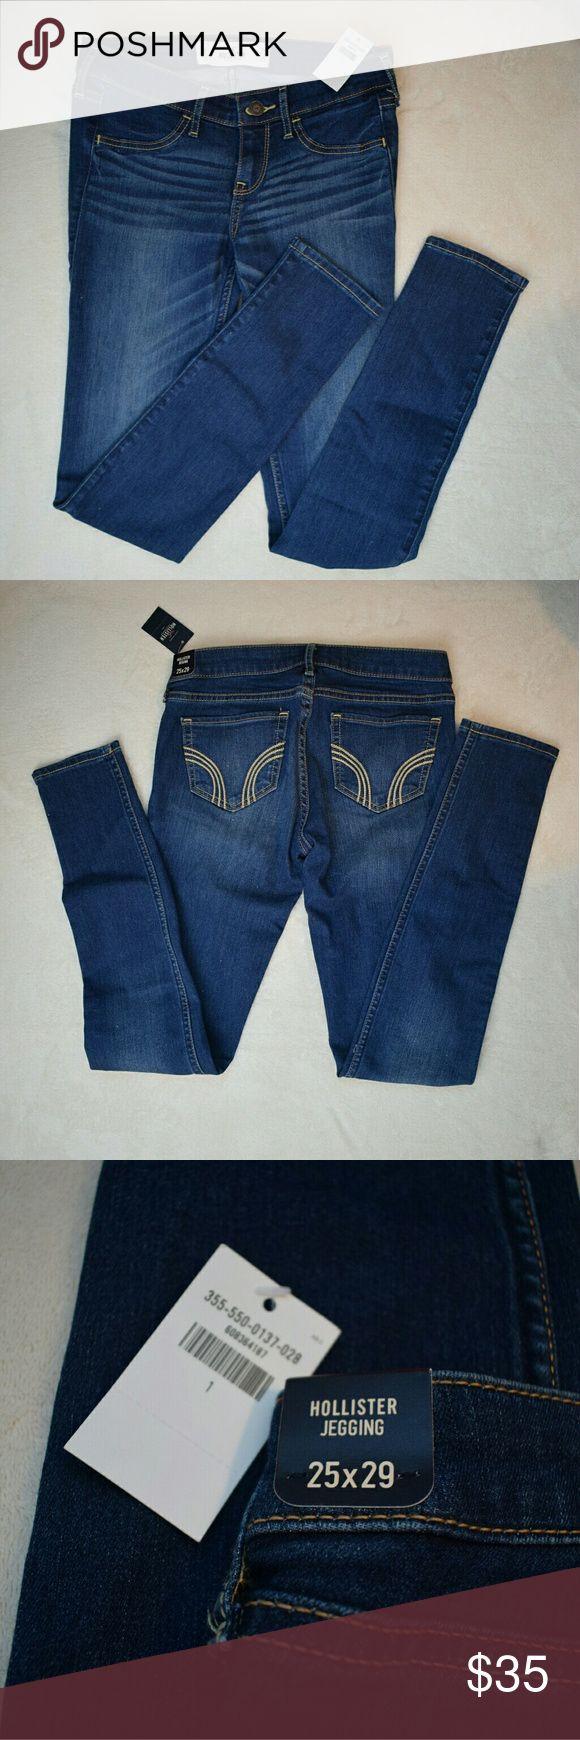 Hollister Jeggings NWT Hollister leggings size 1, 25x29 Hollister Jeans Skinny